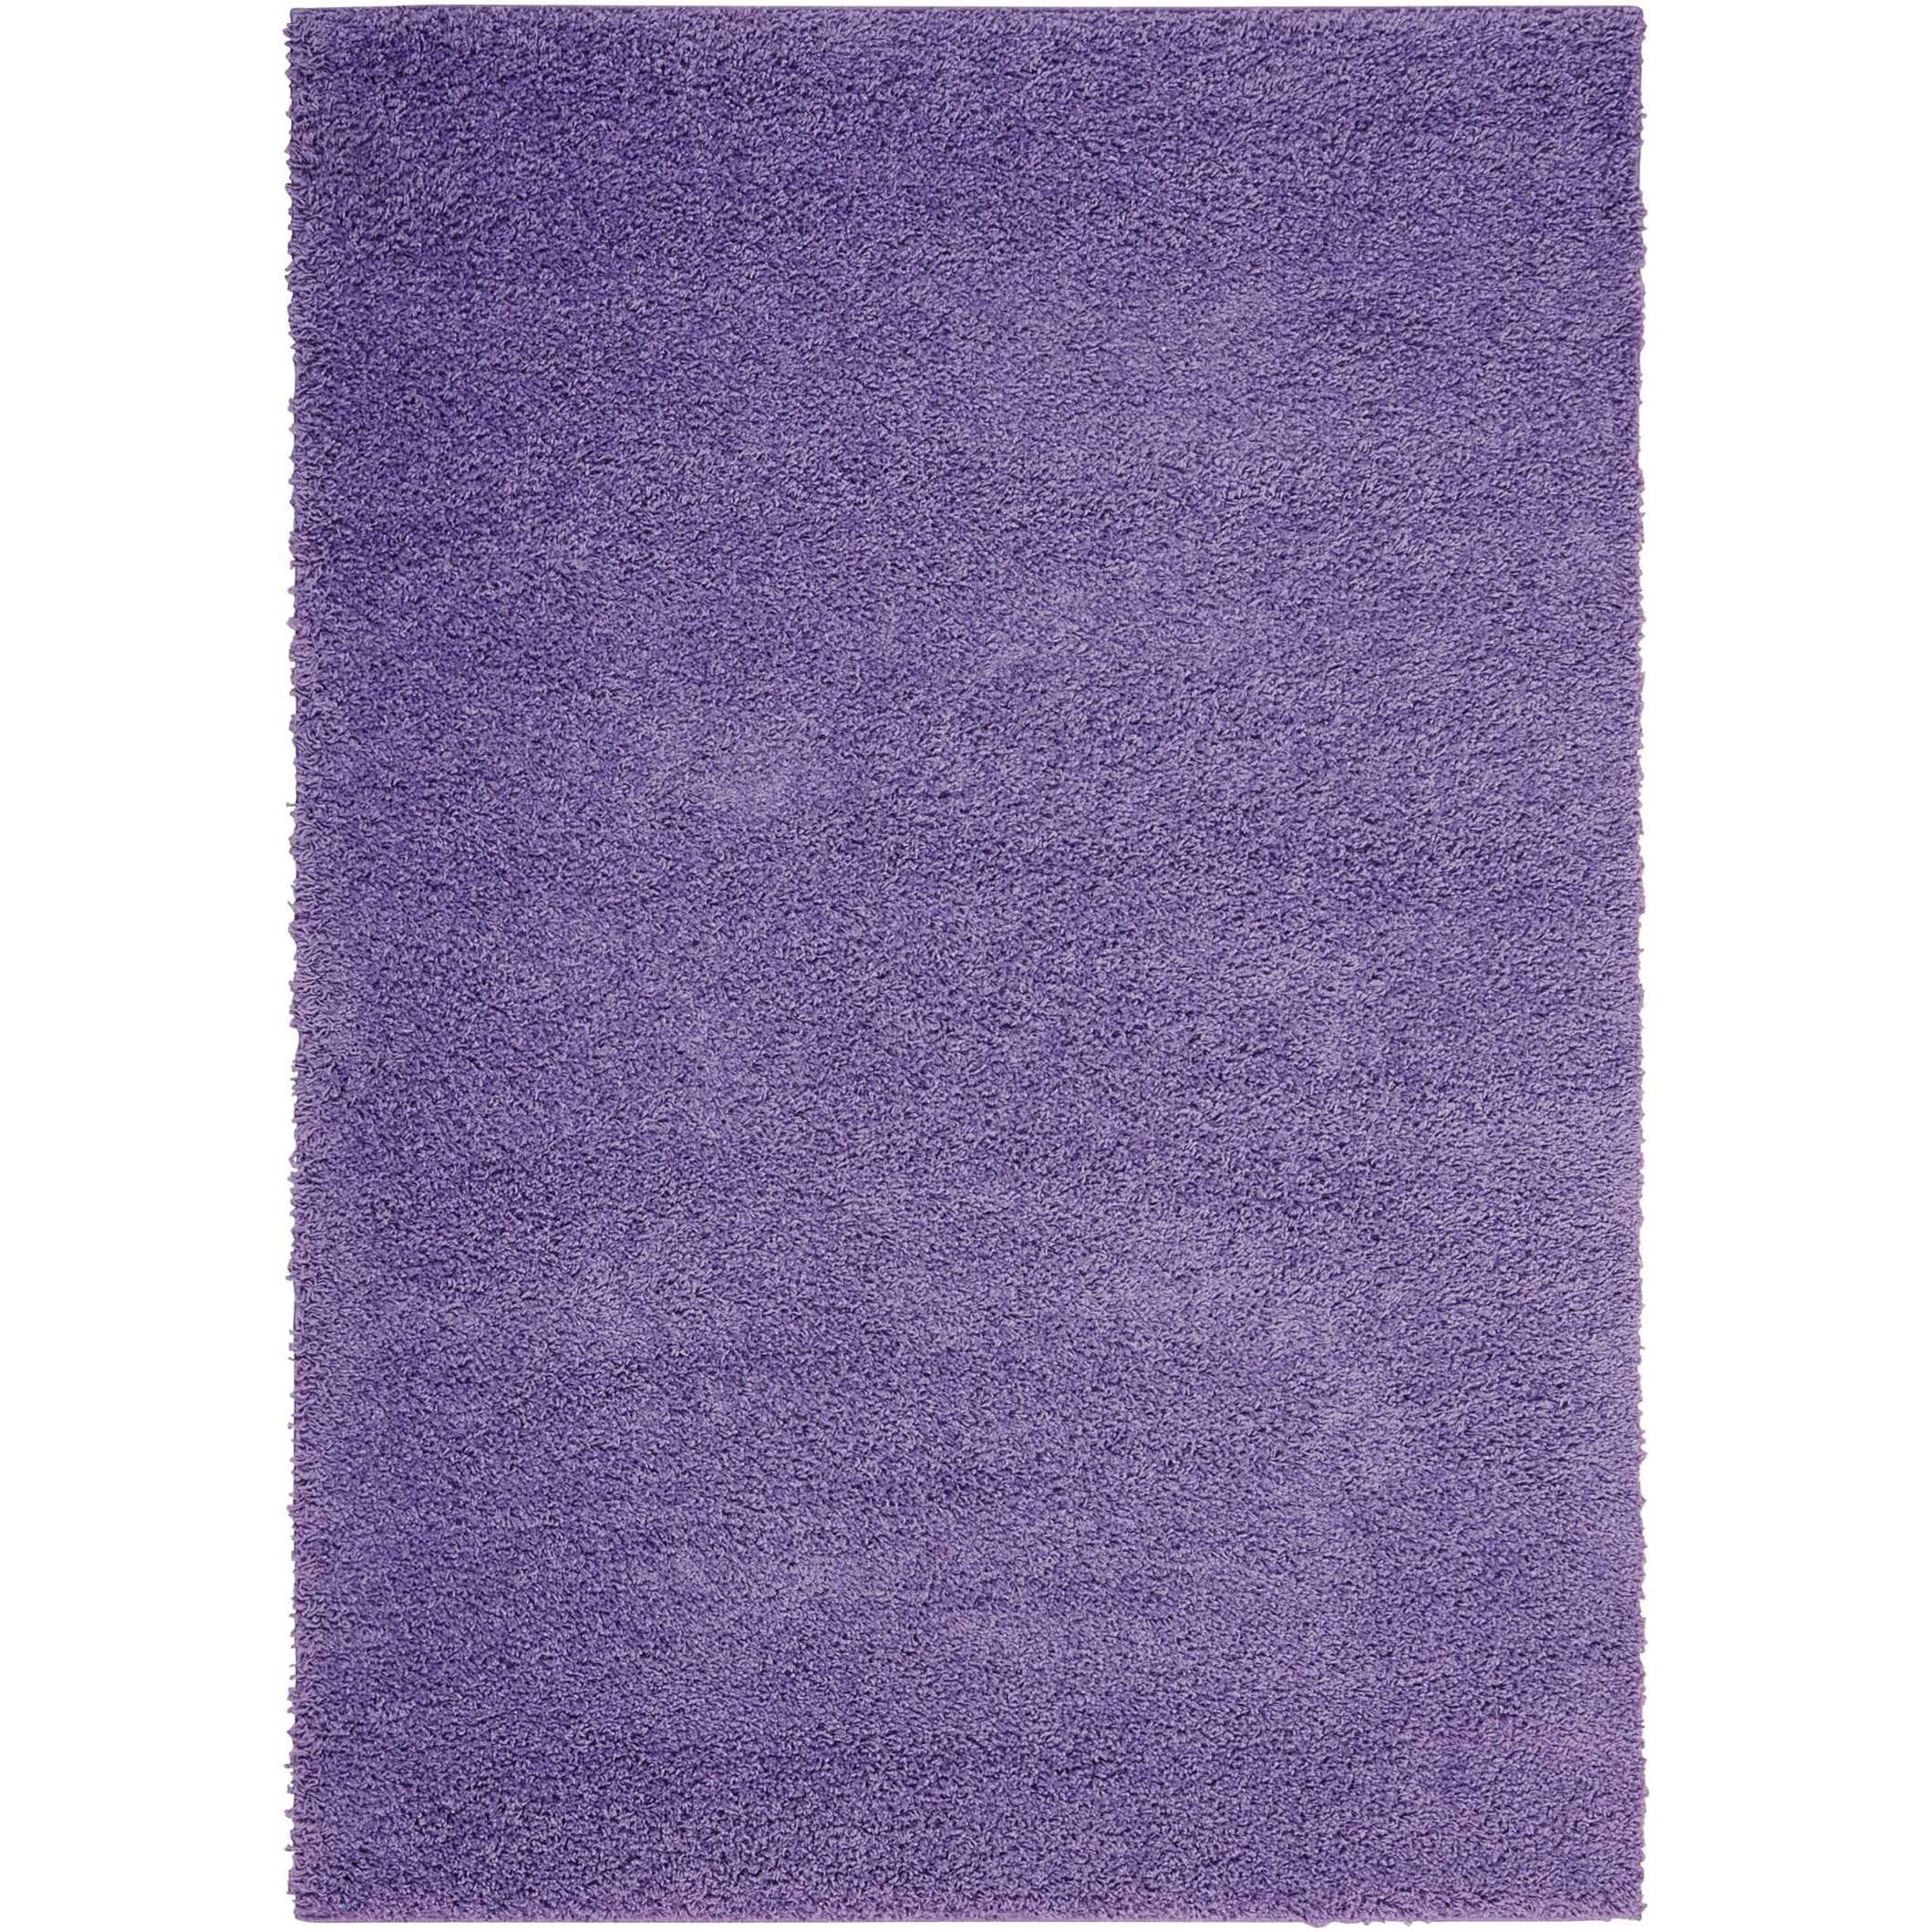 Bonita 5' x 7' Light Violet Rectangle Rug by Nourison at Sprintz Furniture